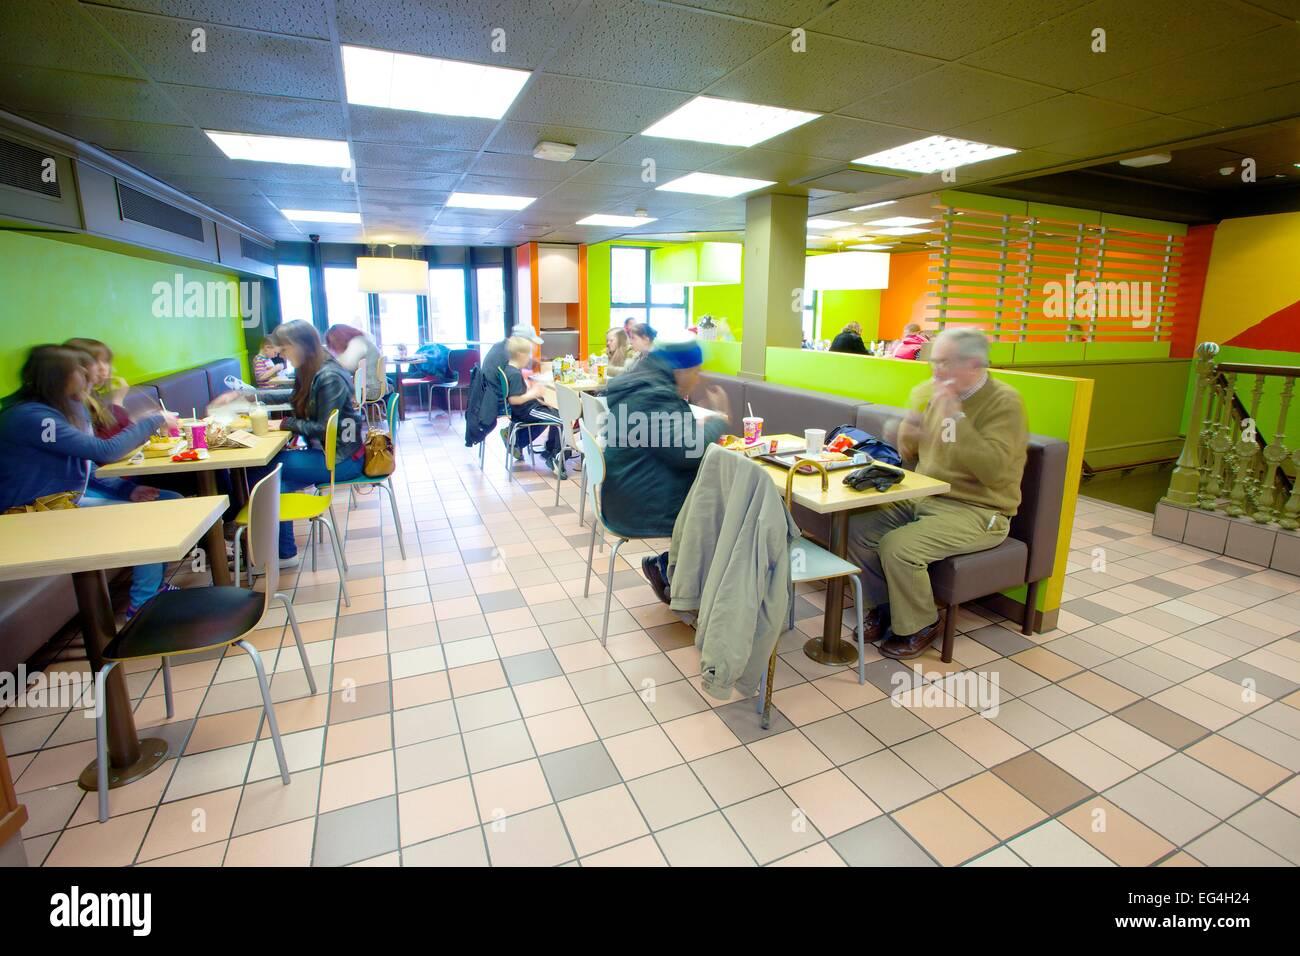 Customers Sitting Down In McDonalds Restaurant Interior.